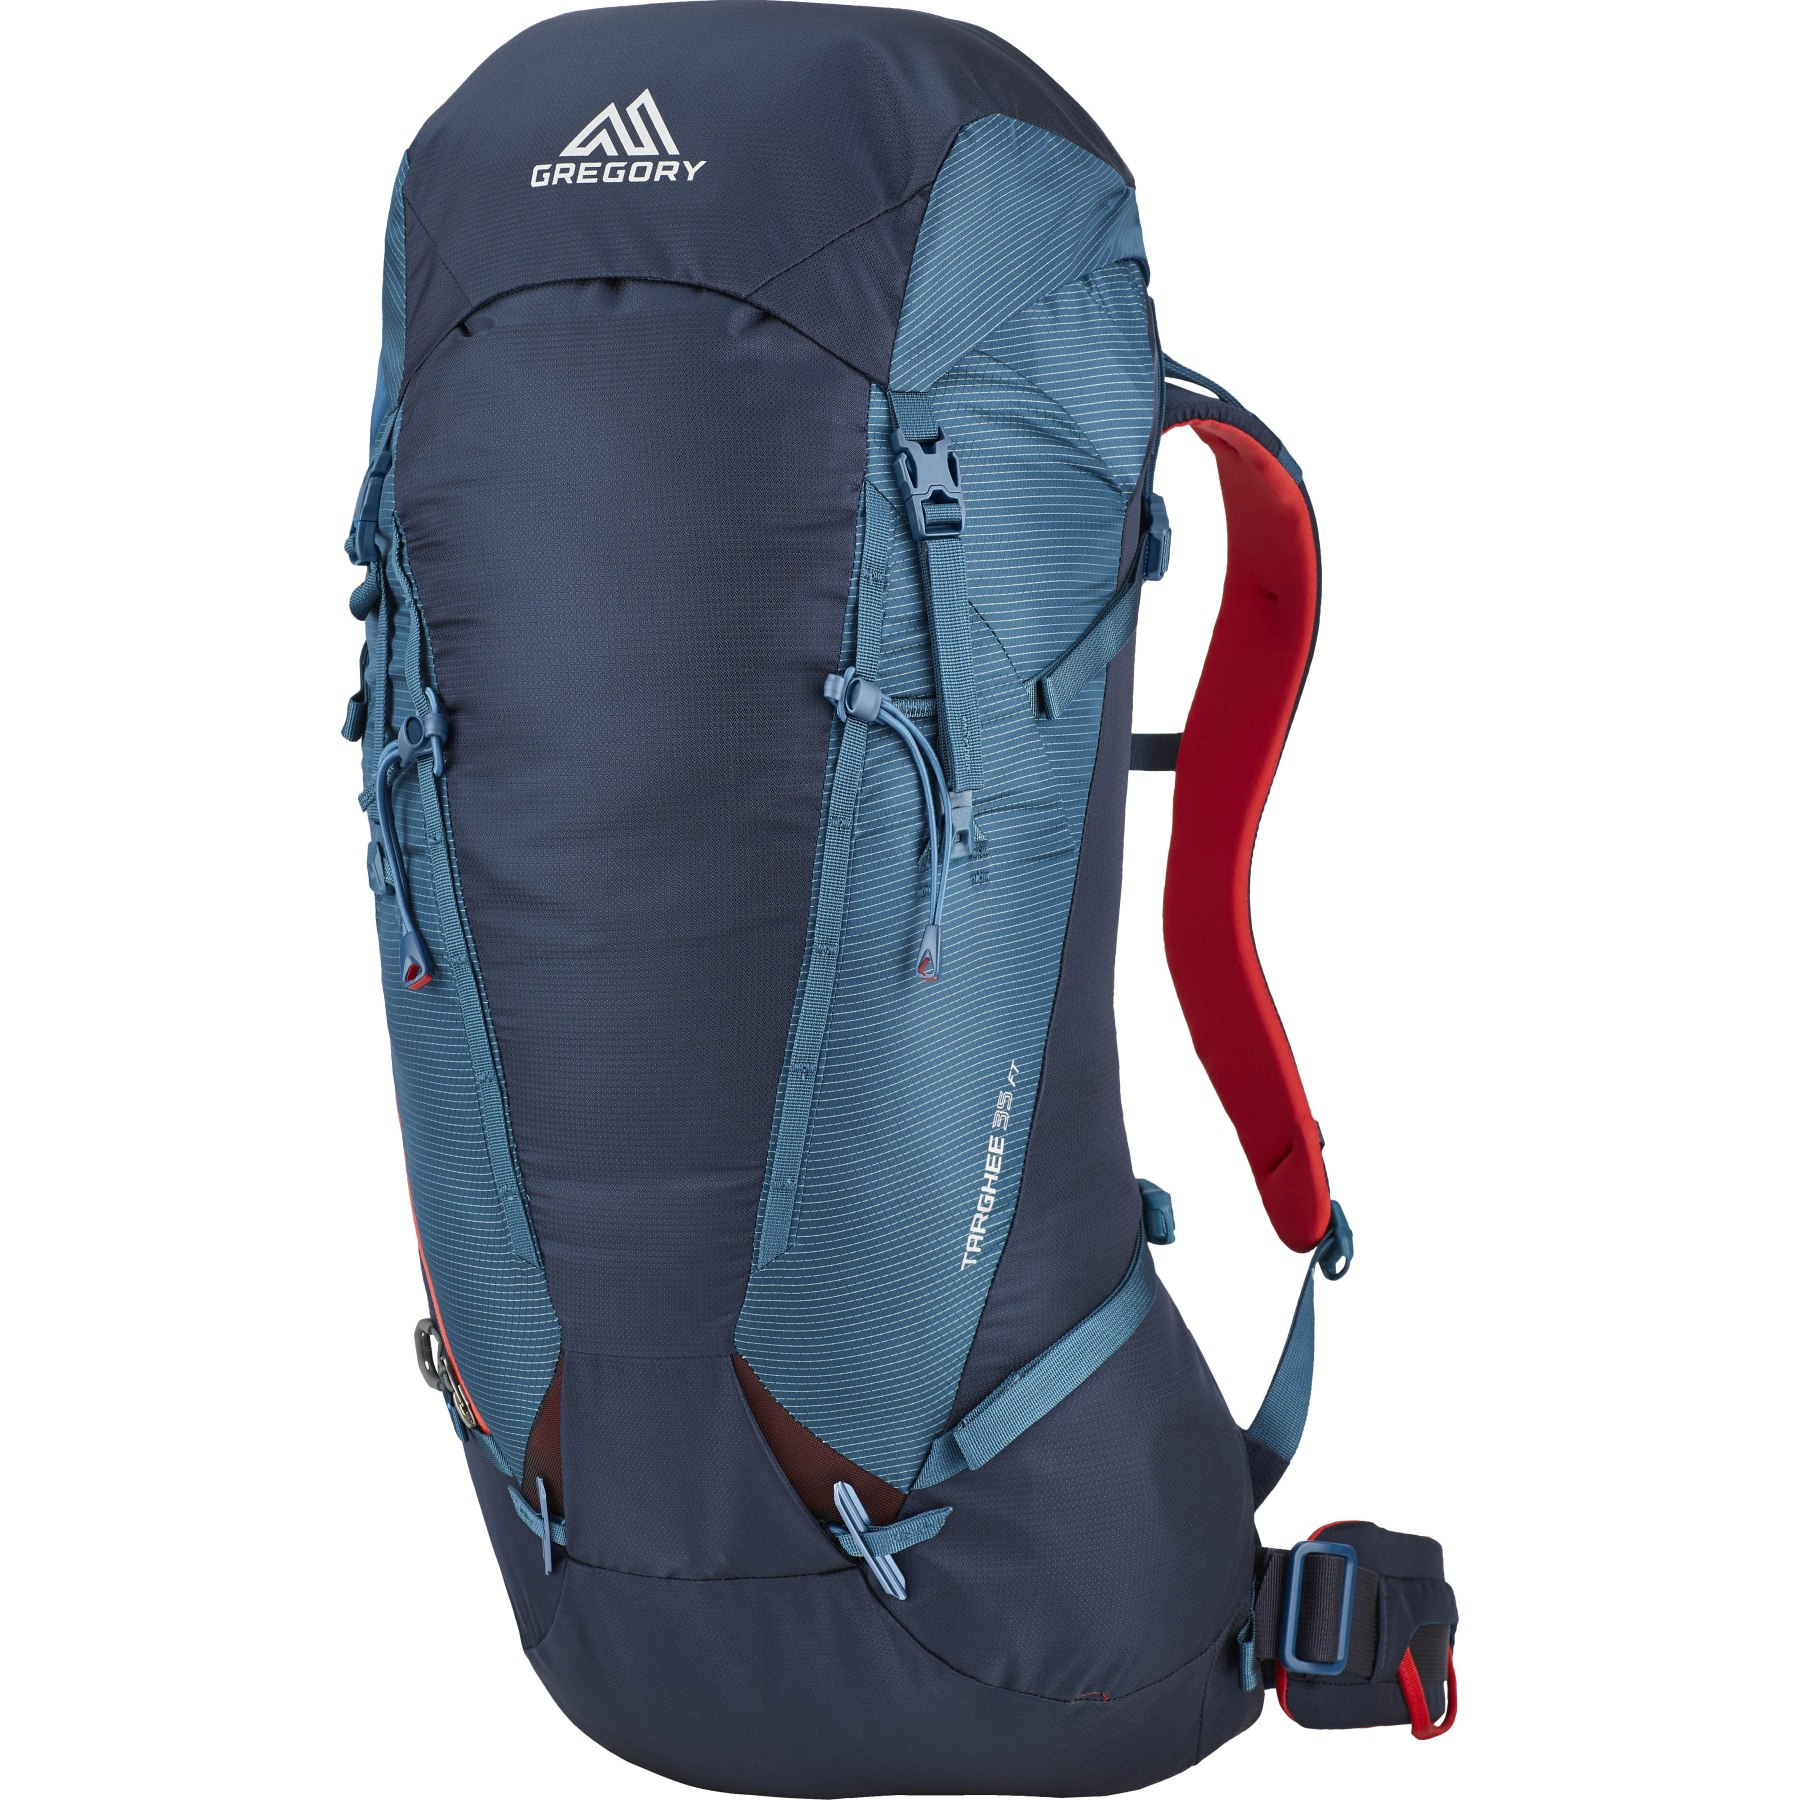 Gregory Targhee FT 35 Backpack - Spark Navy